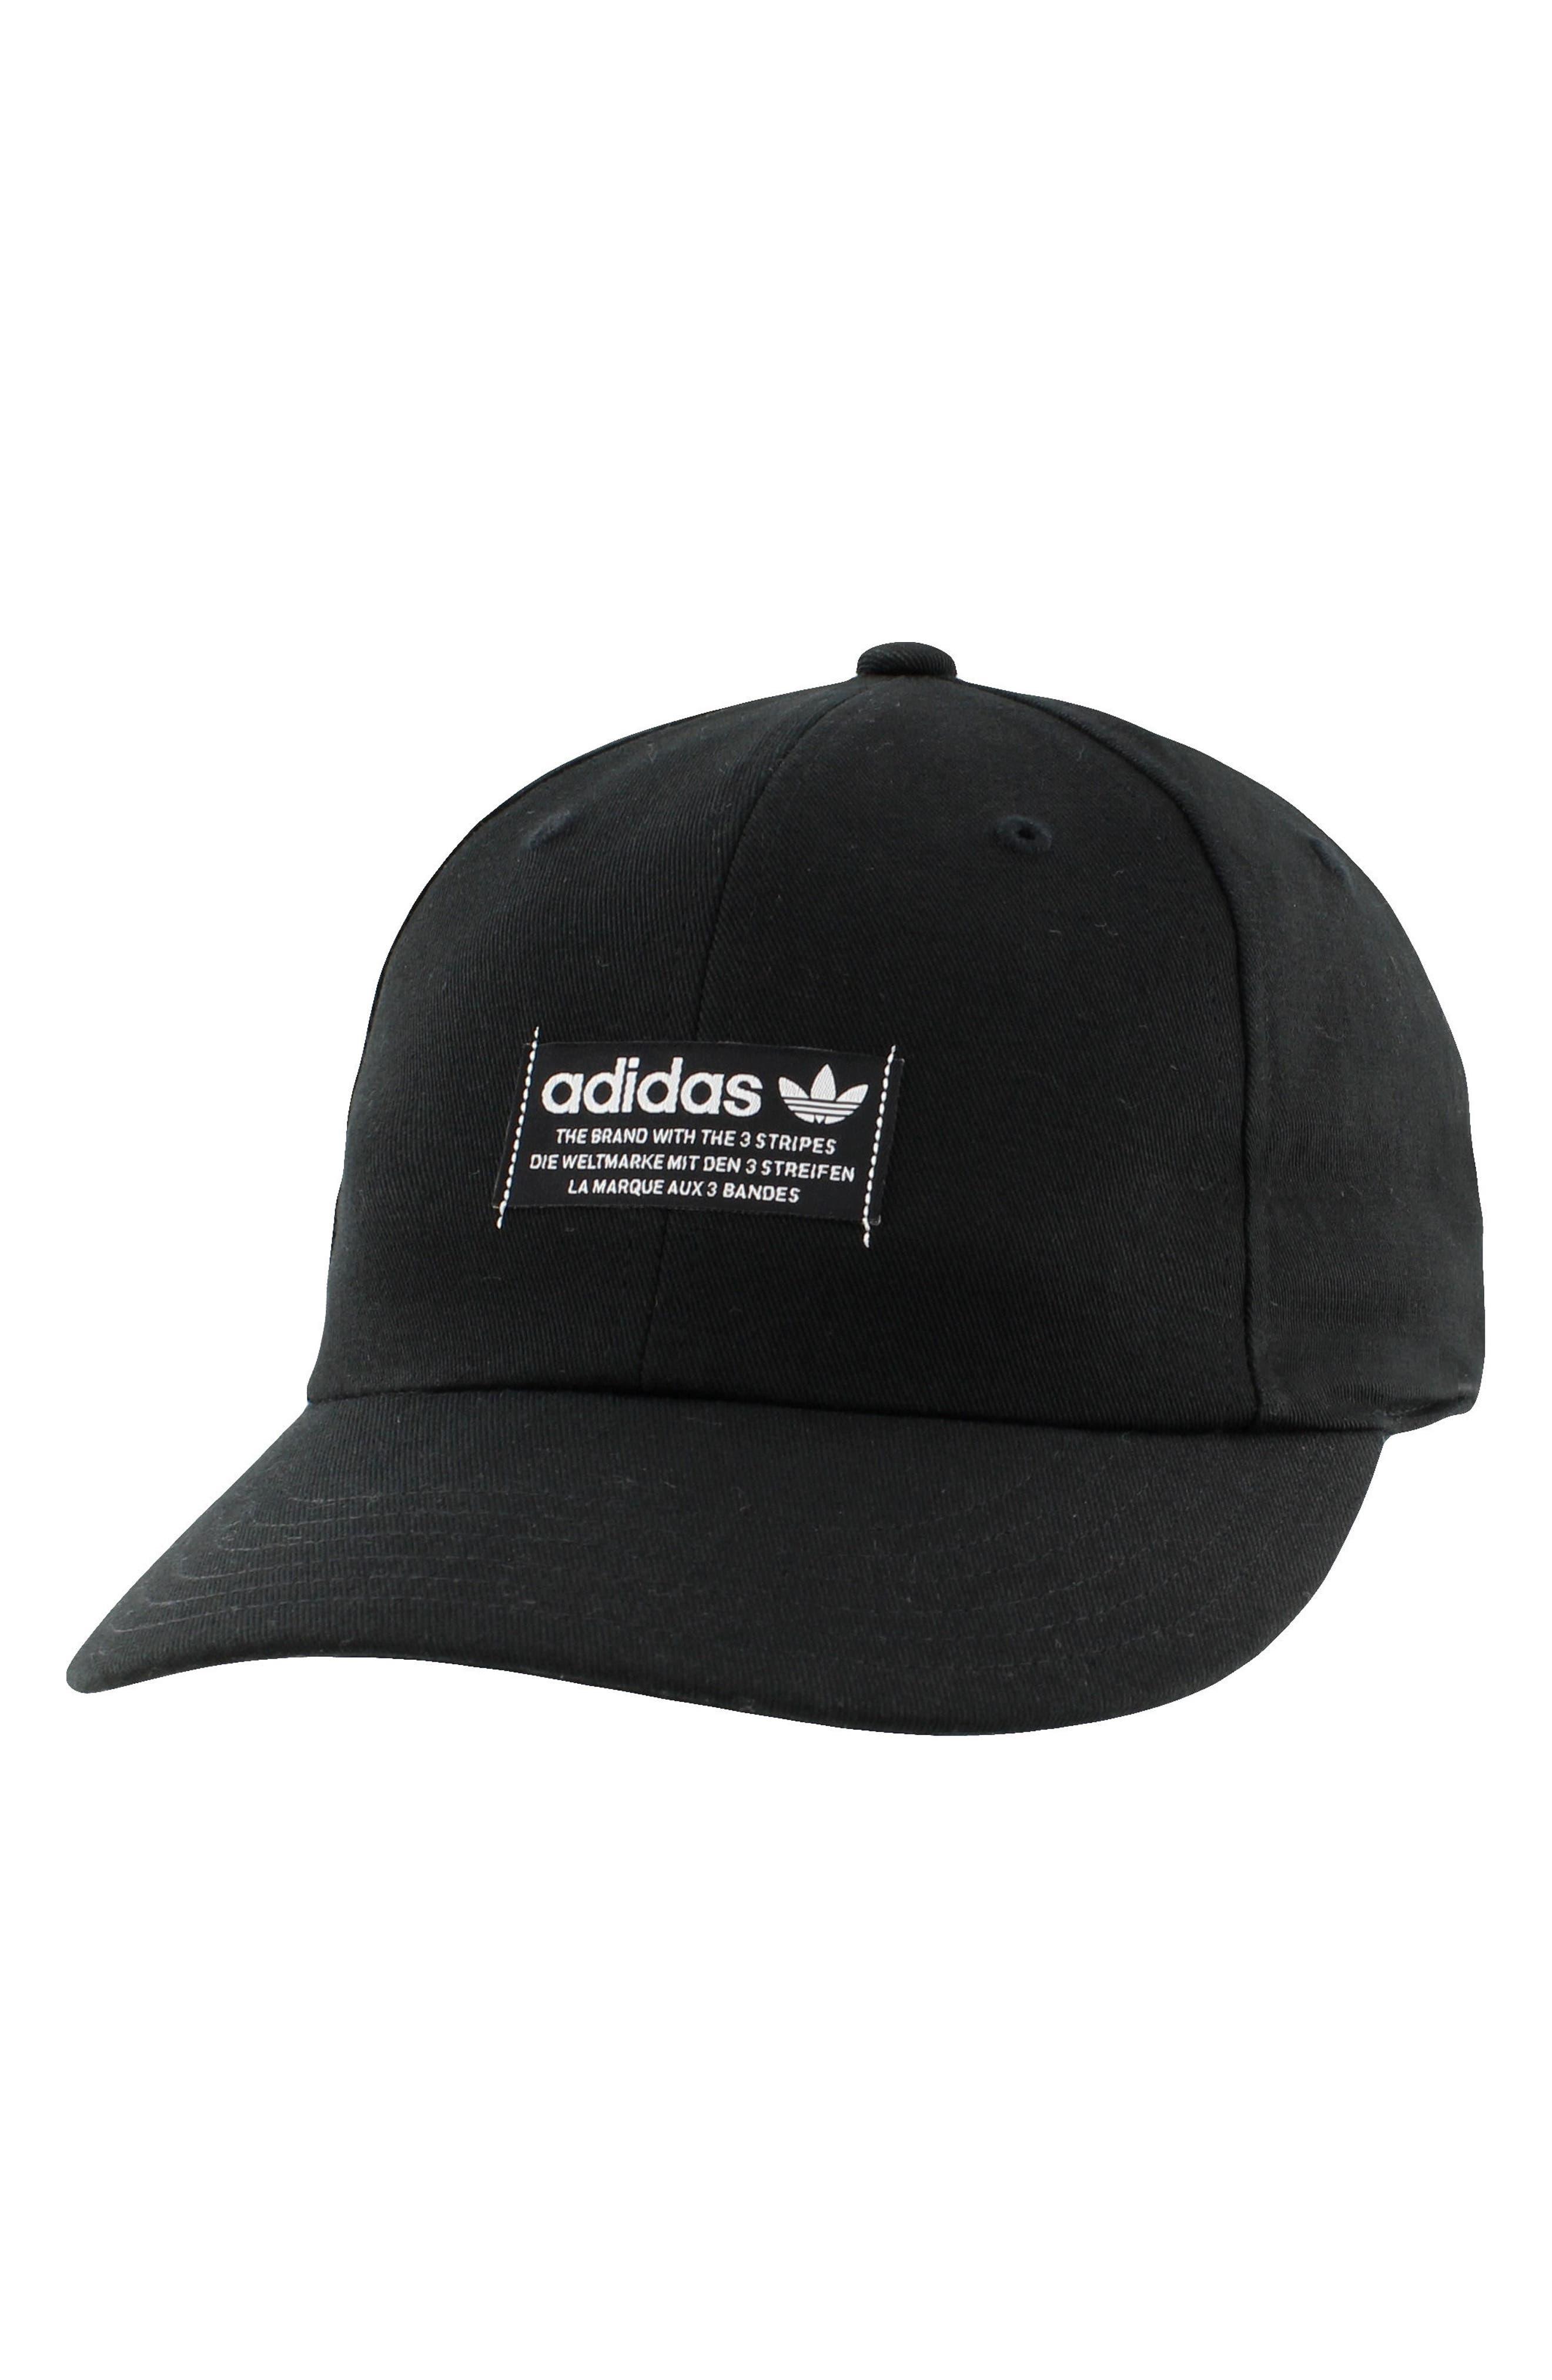 adidas Original Relaxed Patch Ball Cap,                             Main thumbnail 1, color,                             Black